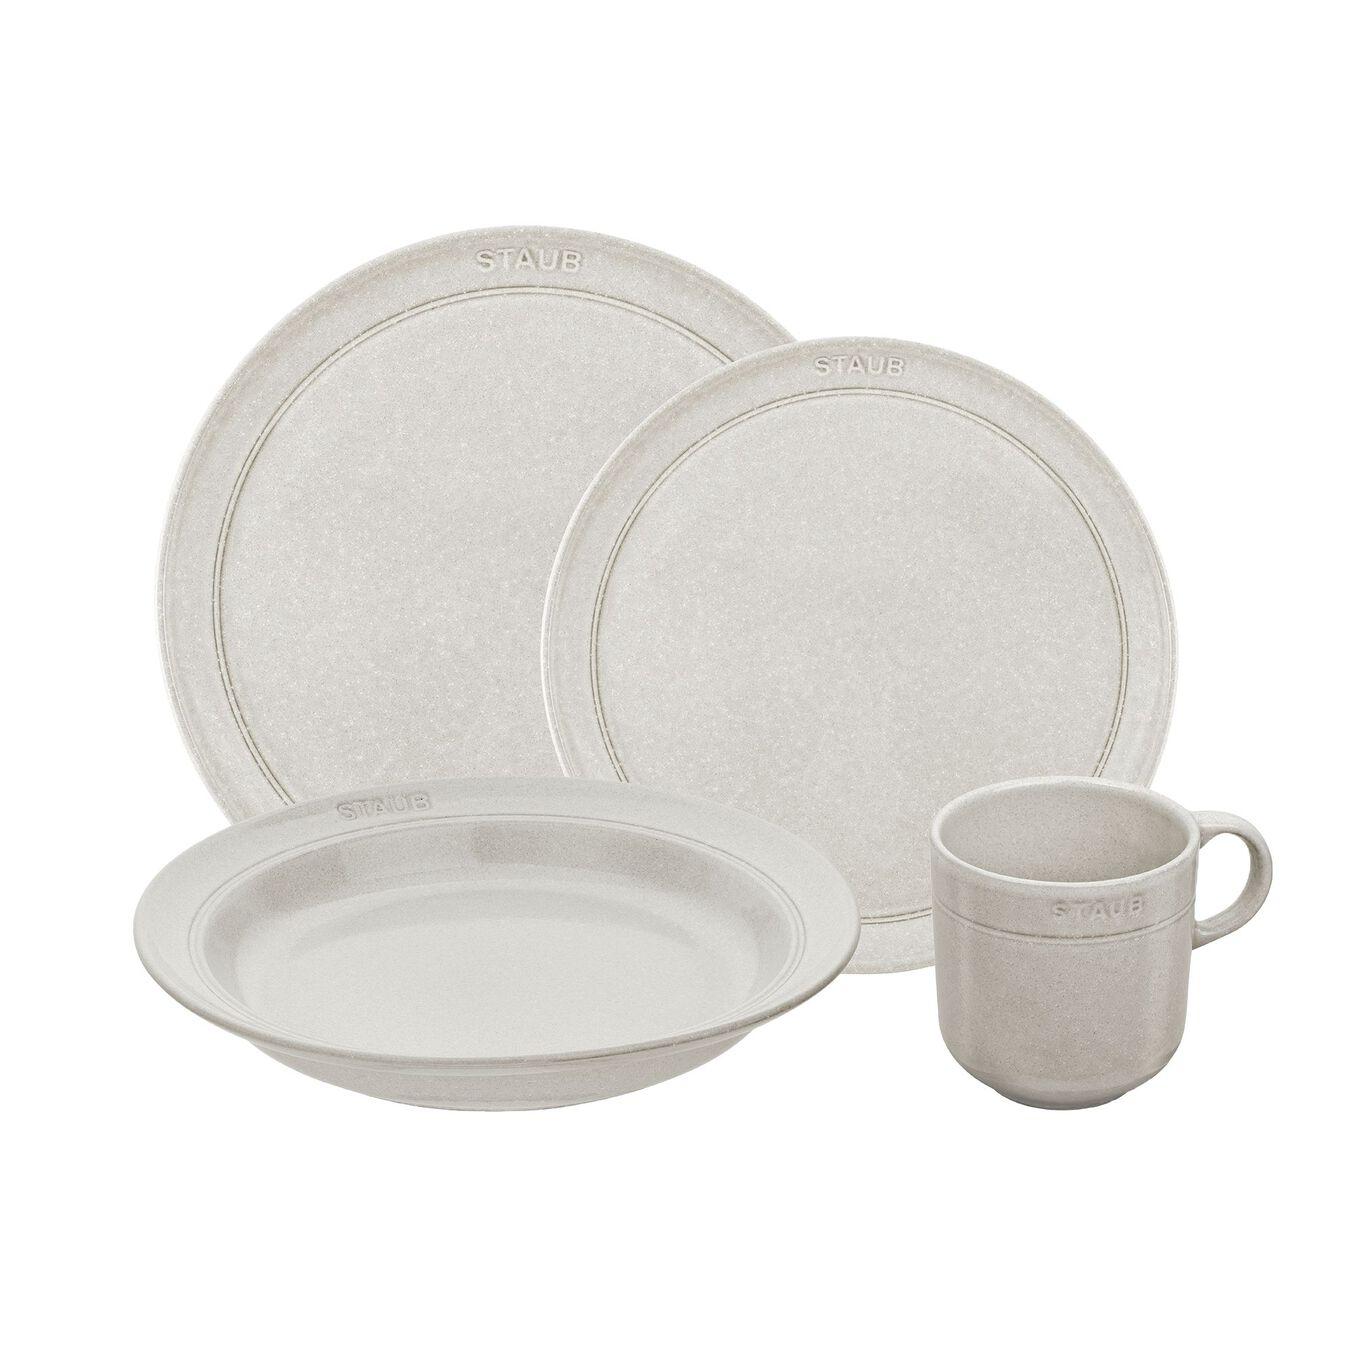 Serving set, 48 Piece | white truffle | Ceramic | Ceramic,,large 1